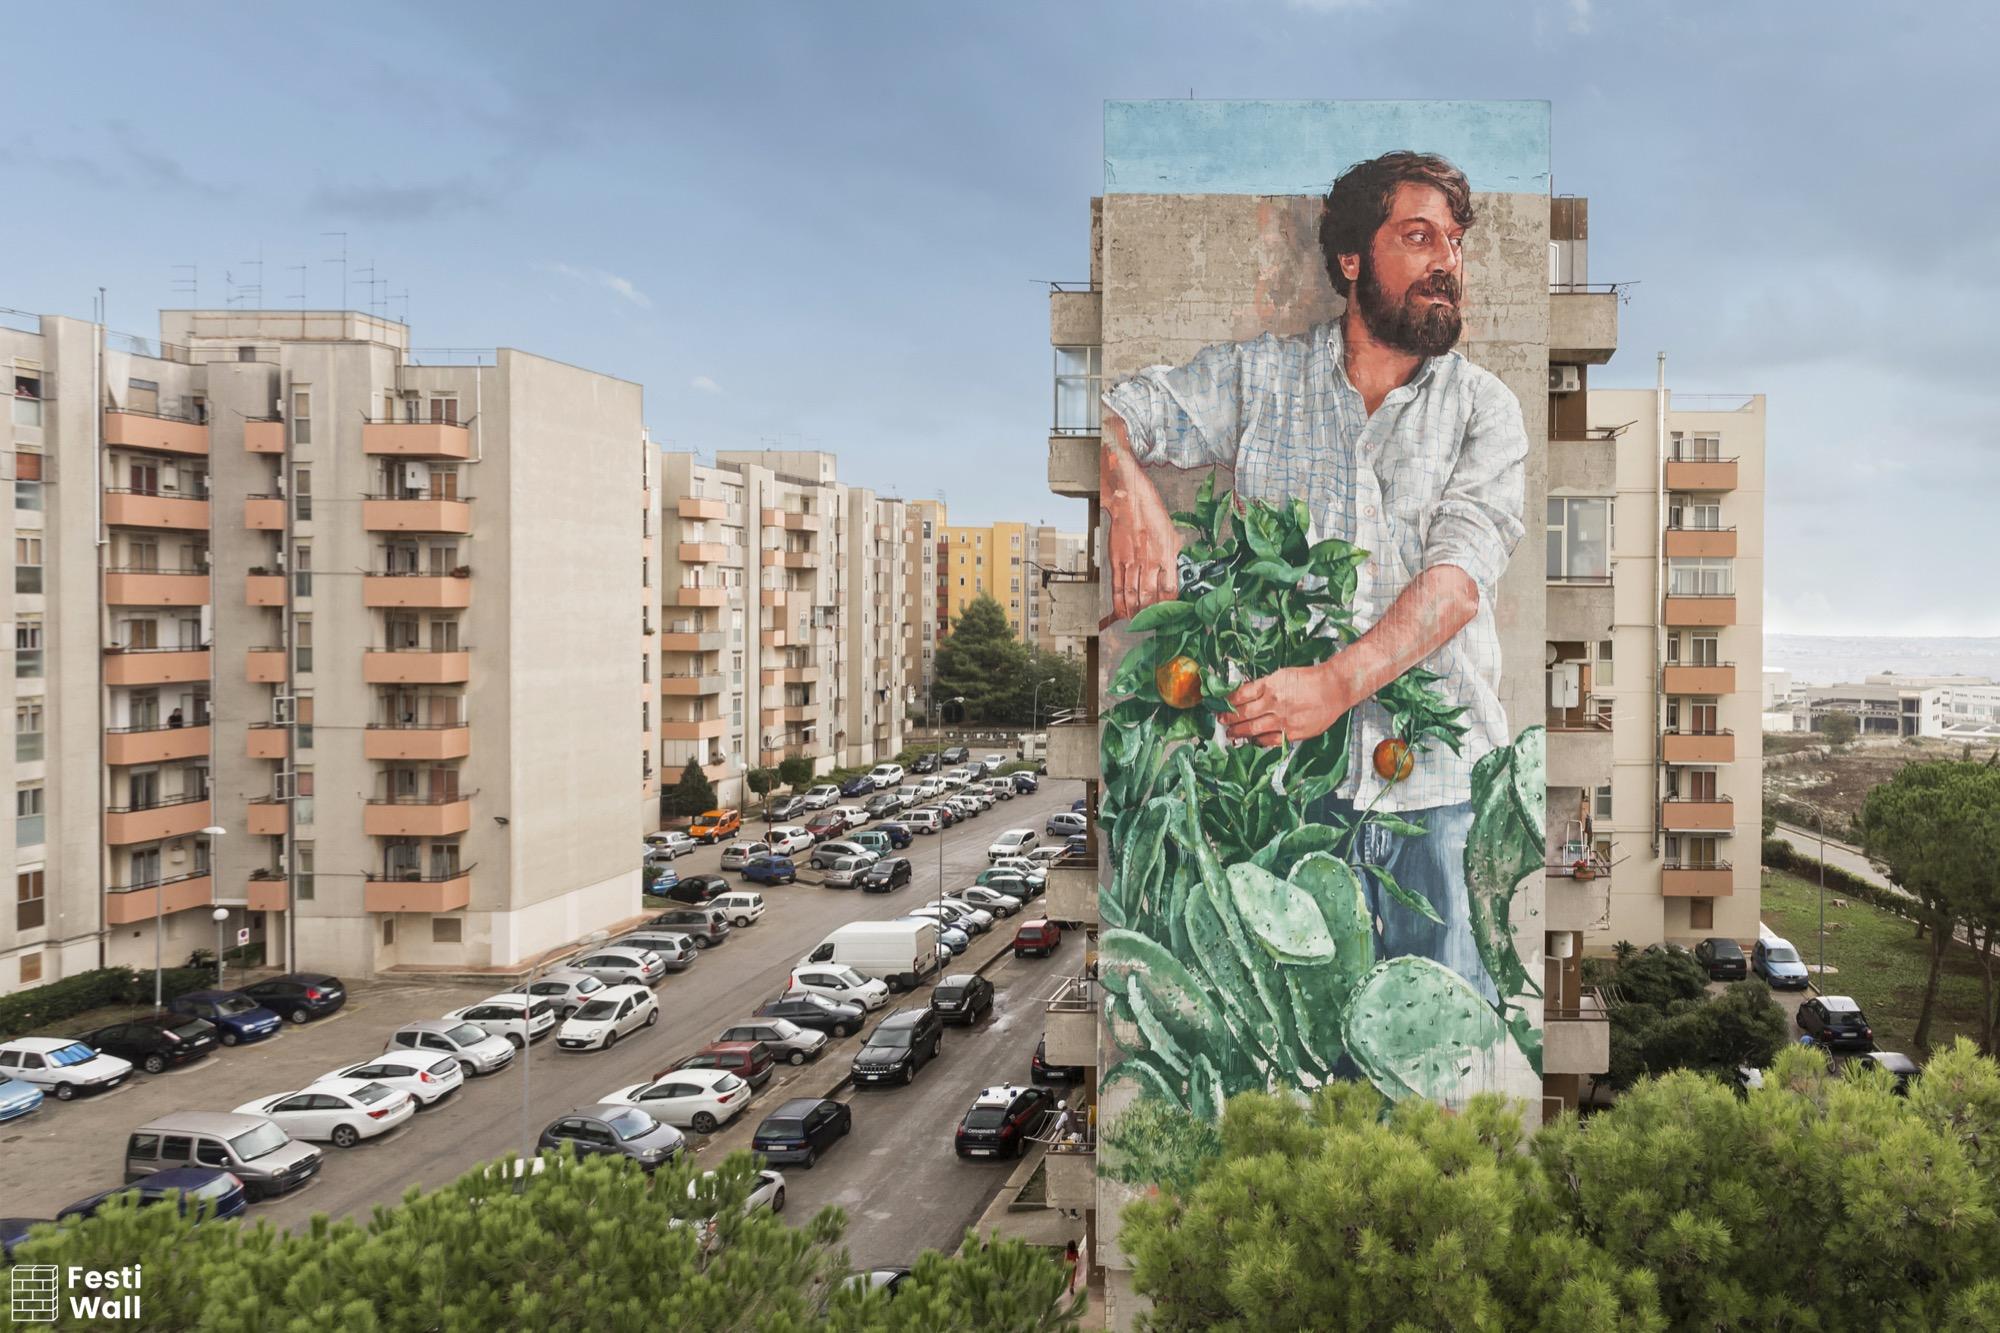 Fintan Magee_The Gardener_ragusa_festiwall_9